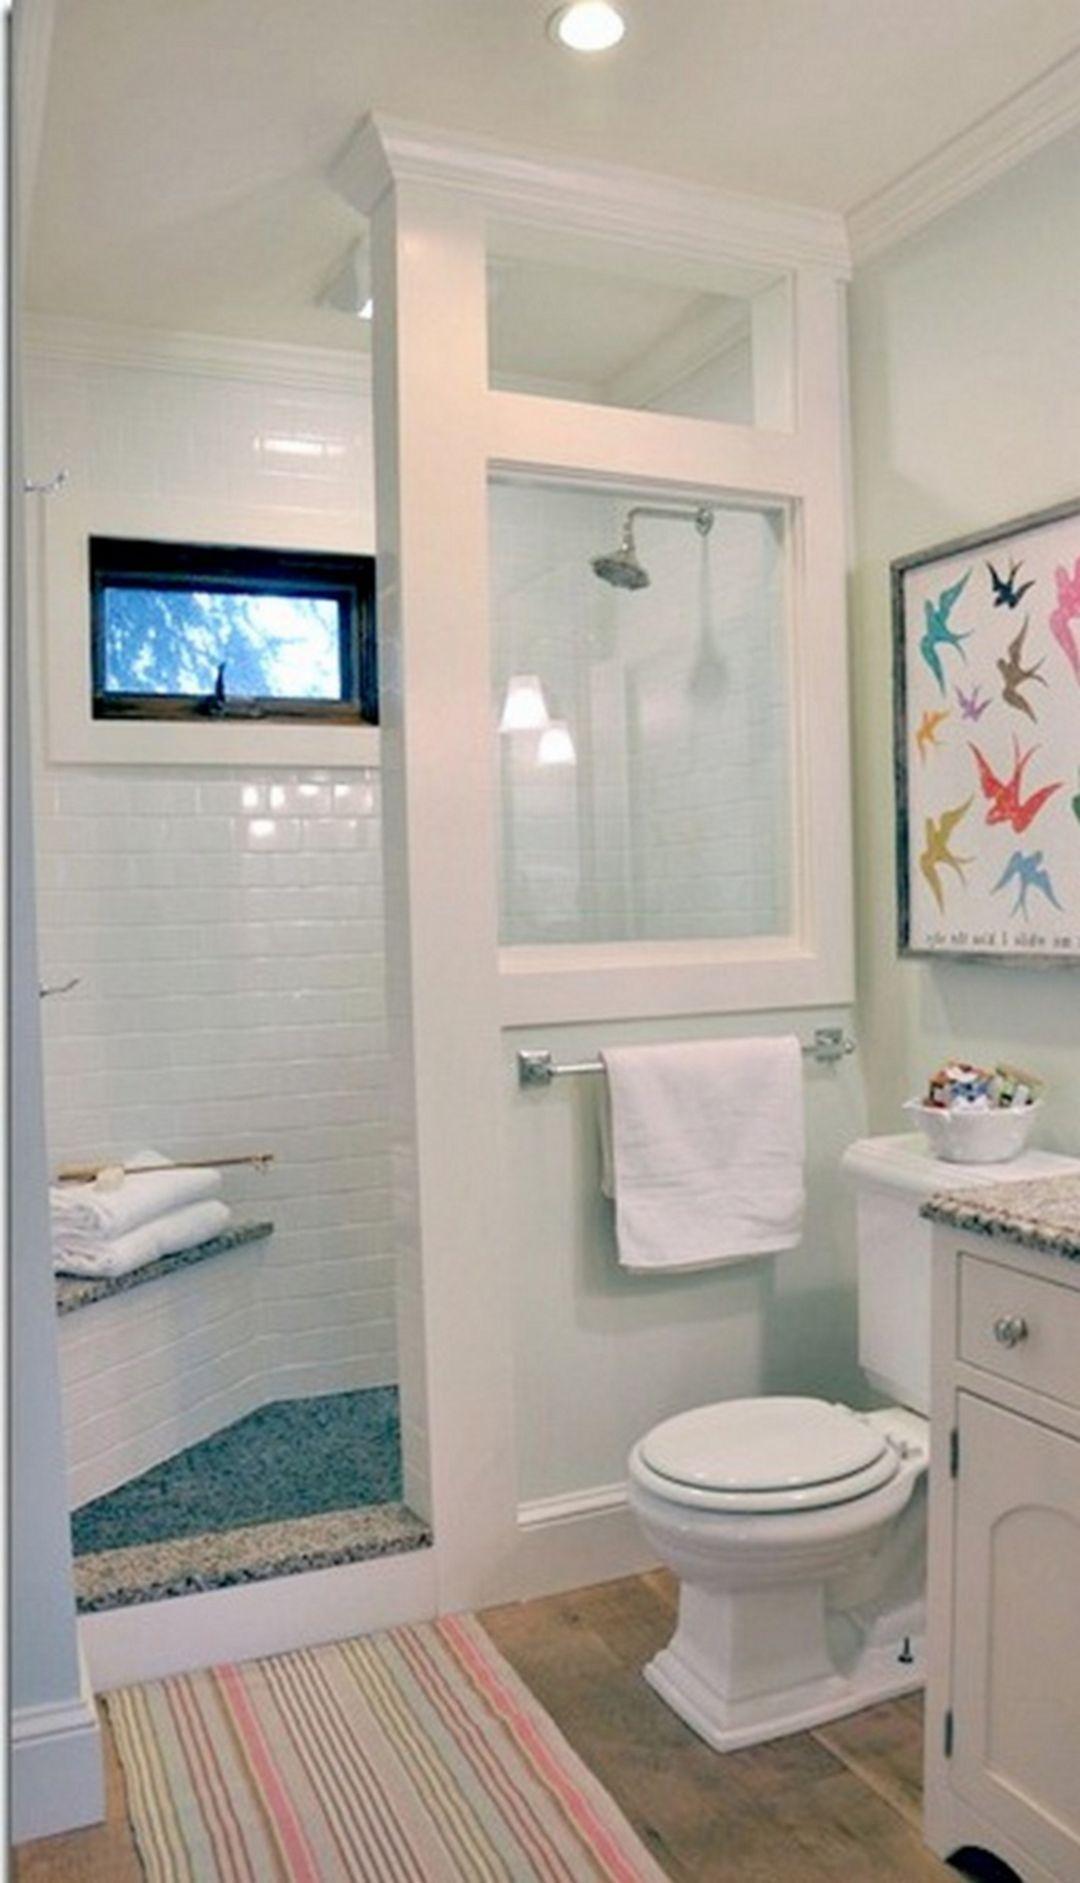 Country bathroom shower ideas Rustic Bathroom 175 Best Modern Bathroom Shower Ideas For Small Bathroom Pinterest 175 Best Modern Bathroom Shower Ideas For Small Bathroom Small